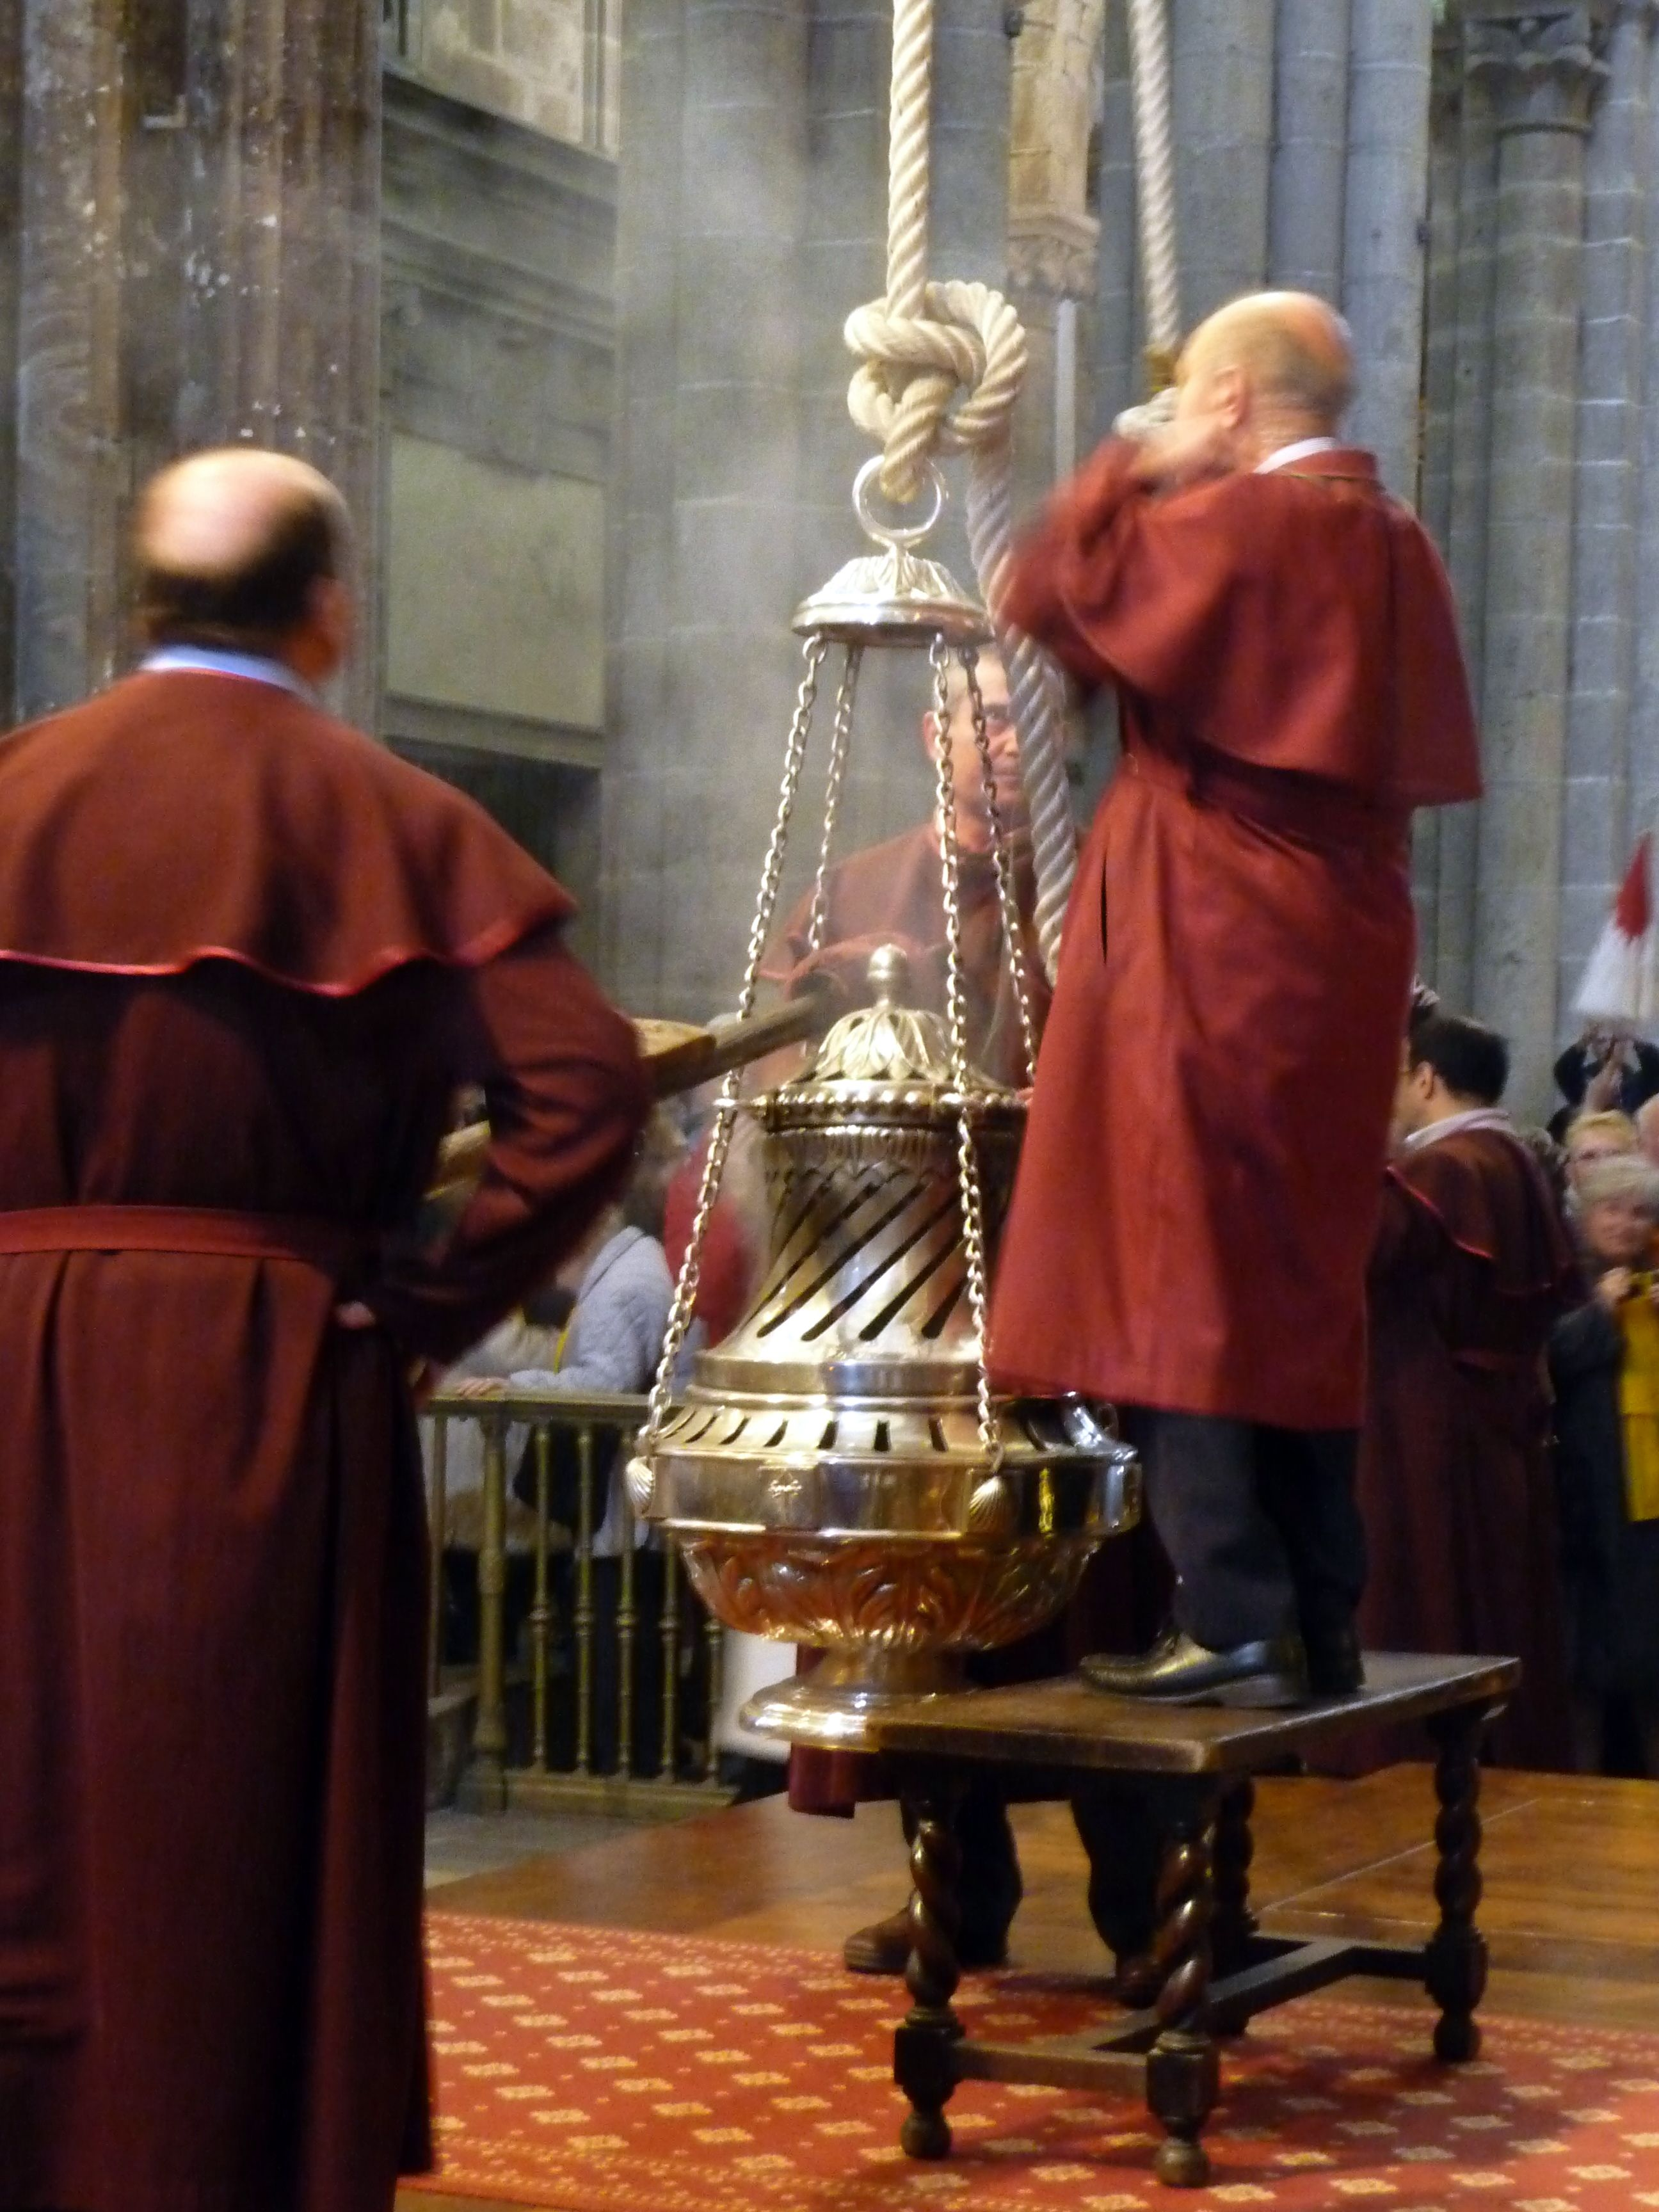 Cathedral Of Santiago De Compostela Botafumeiro An Amazing Experience At Pilgrim Mass Spain Pilgrimage Santiago De Compostela Camino De Santiago